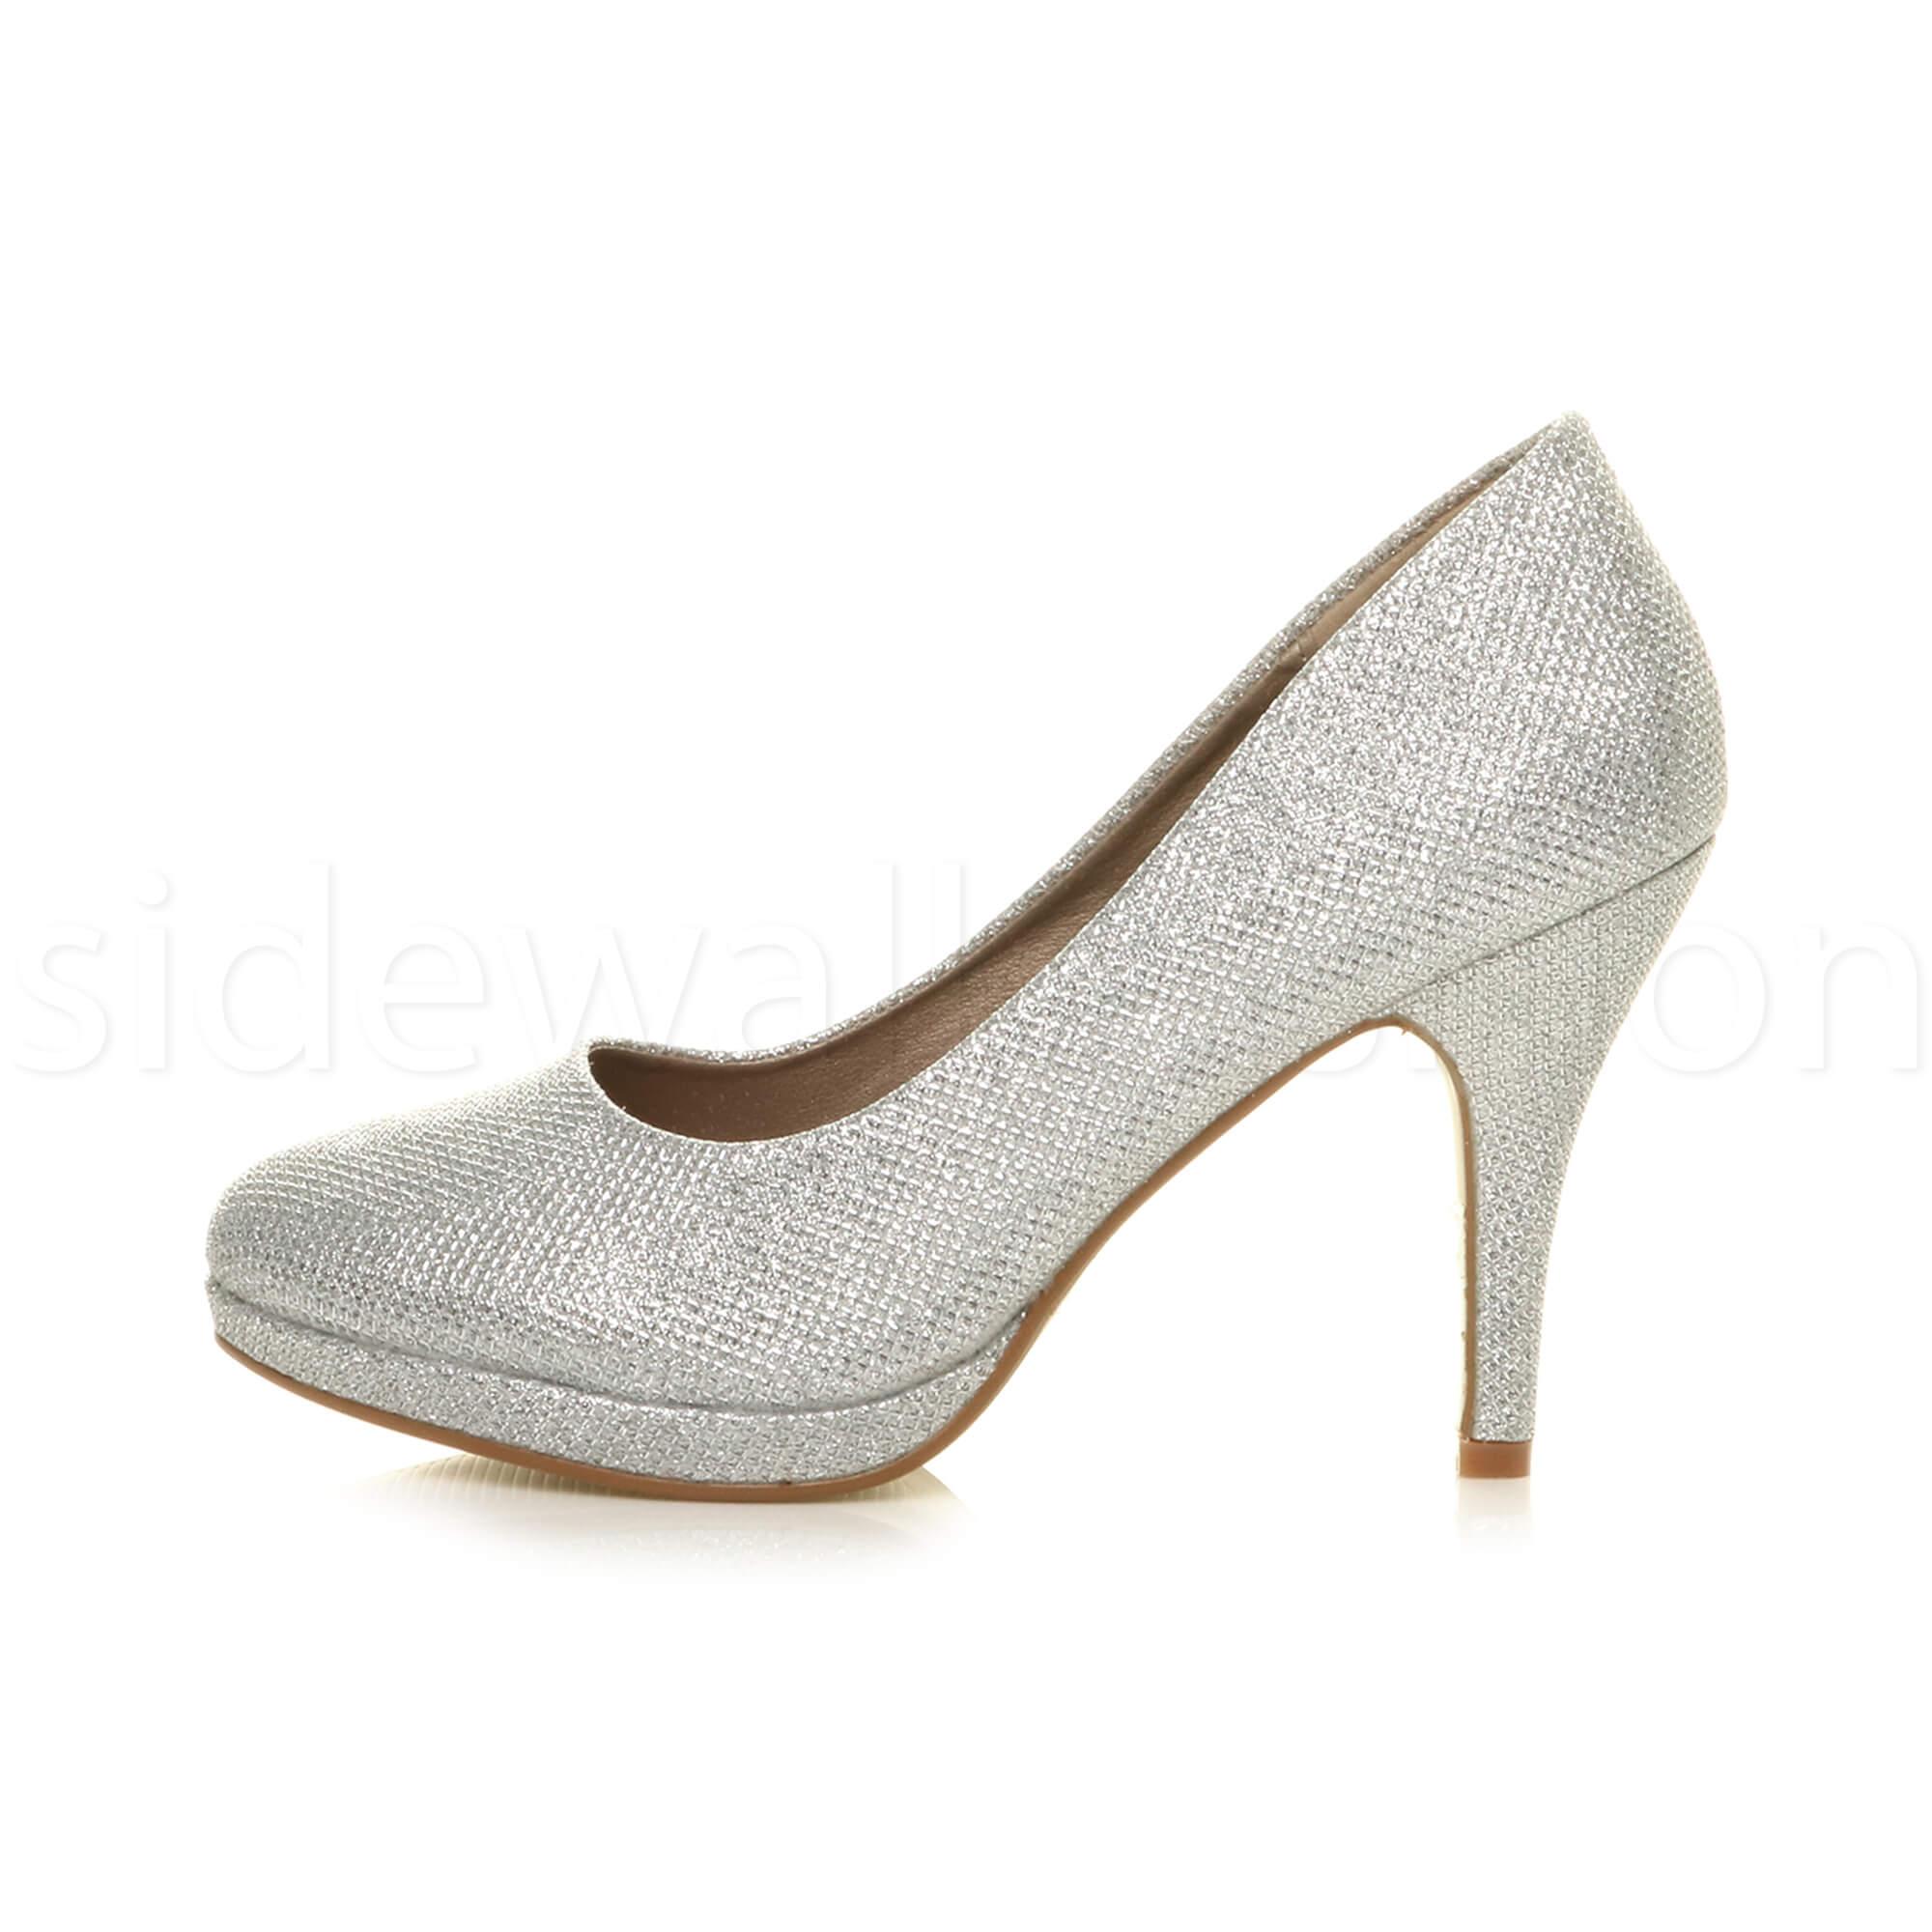 Womens-ladies-high-mid-heel-platform-wedding-evening-bridesmaid-court-shoes-size thumbnail 171